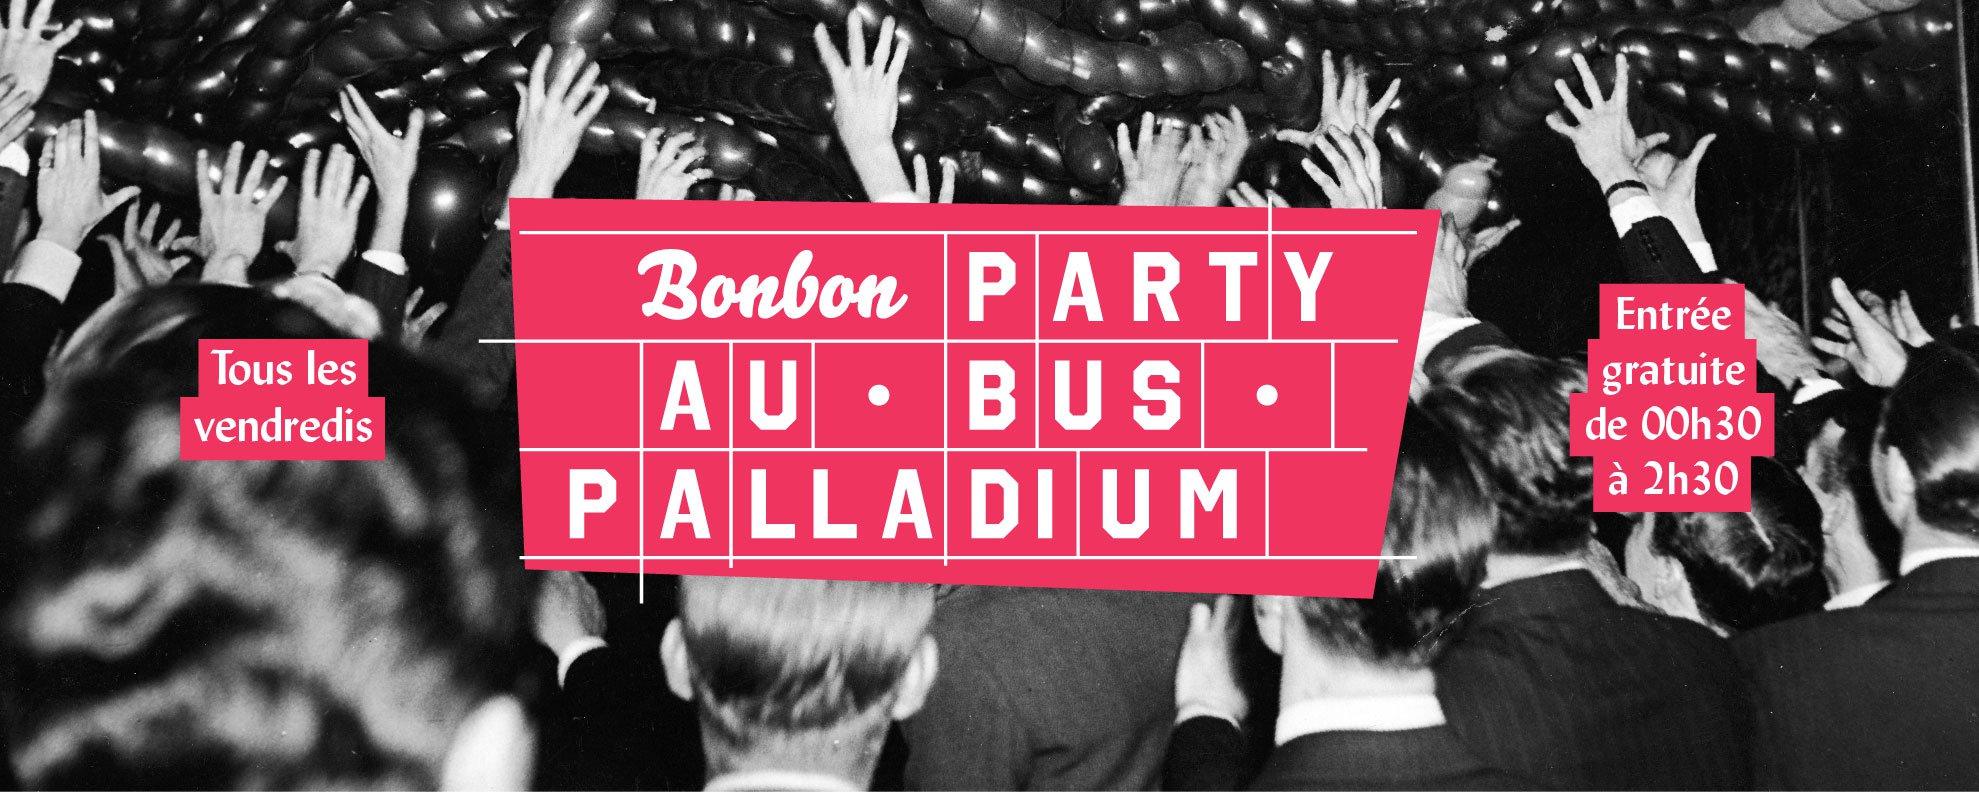 bonbon party bus palladium